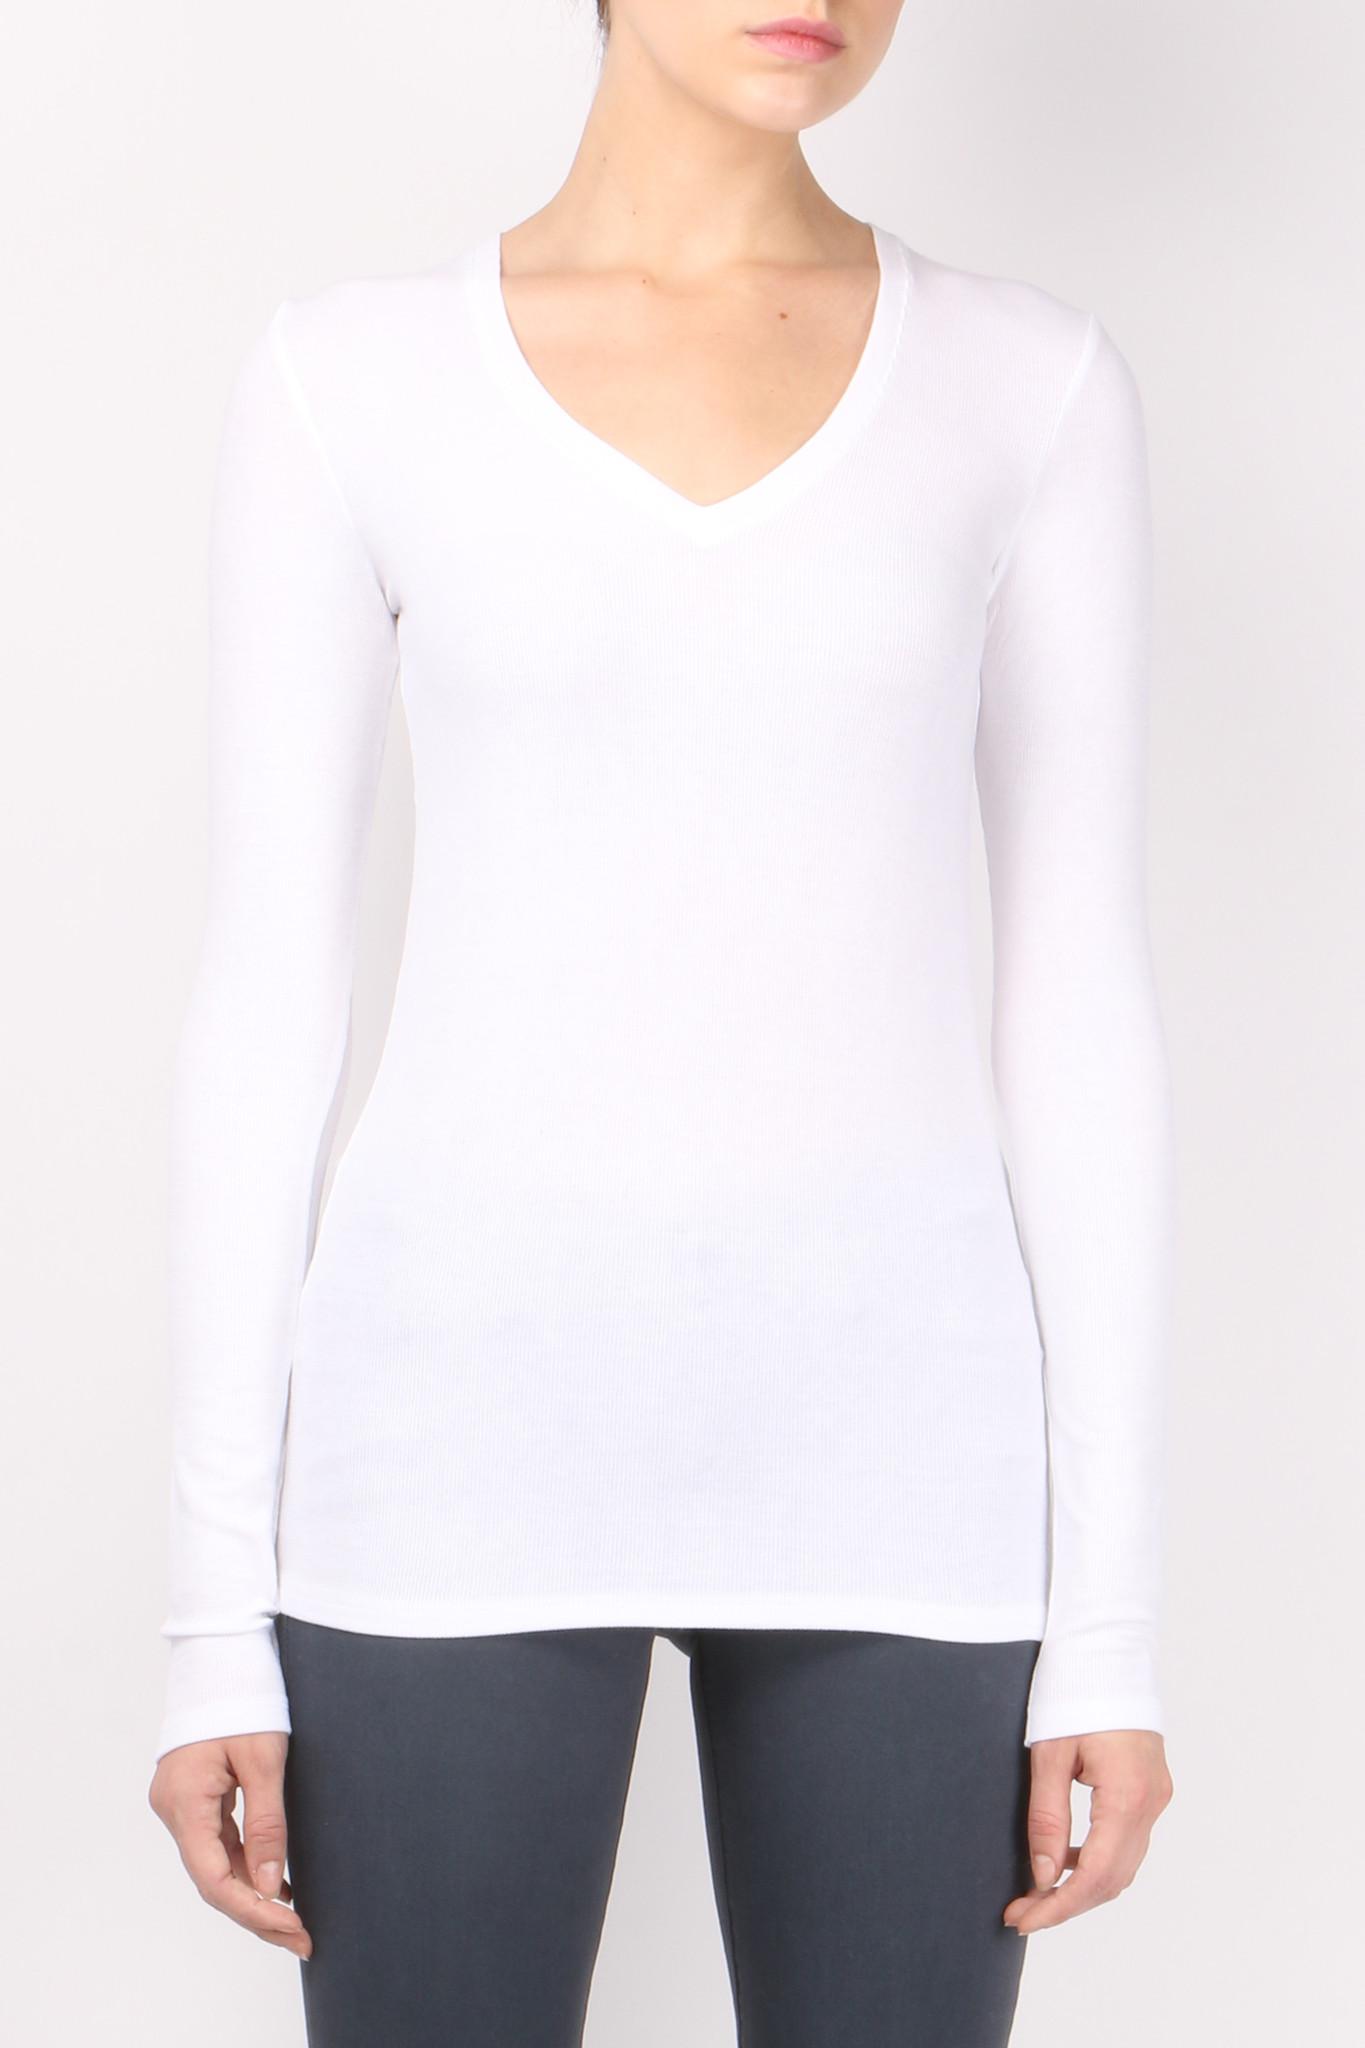 Atm long sleeve v neck rib shirt white garmentory for Atm t shirt sale